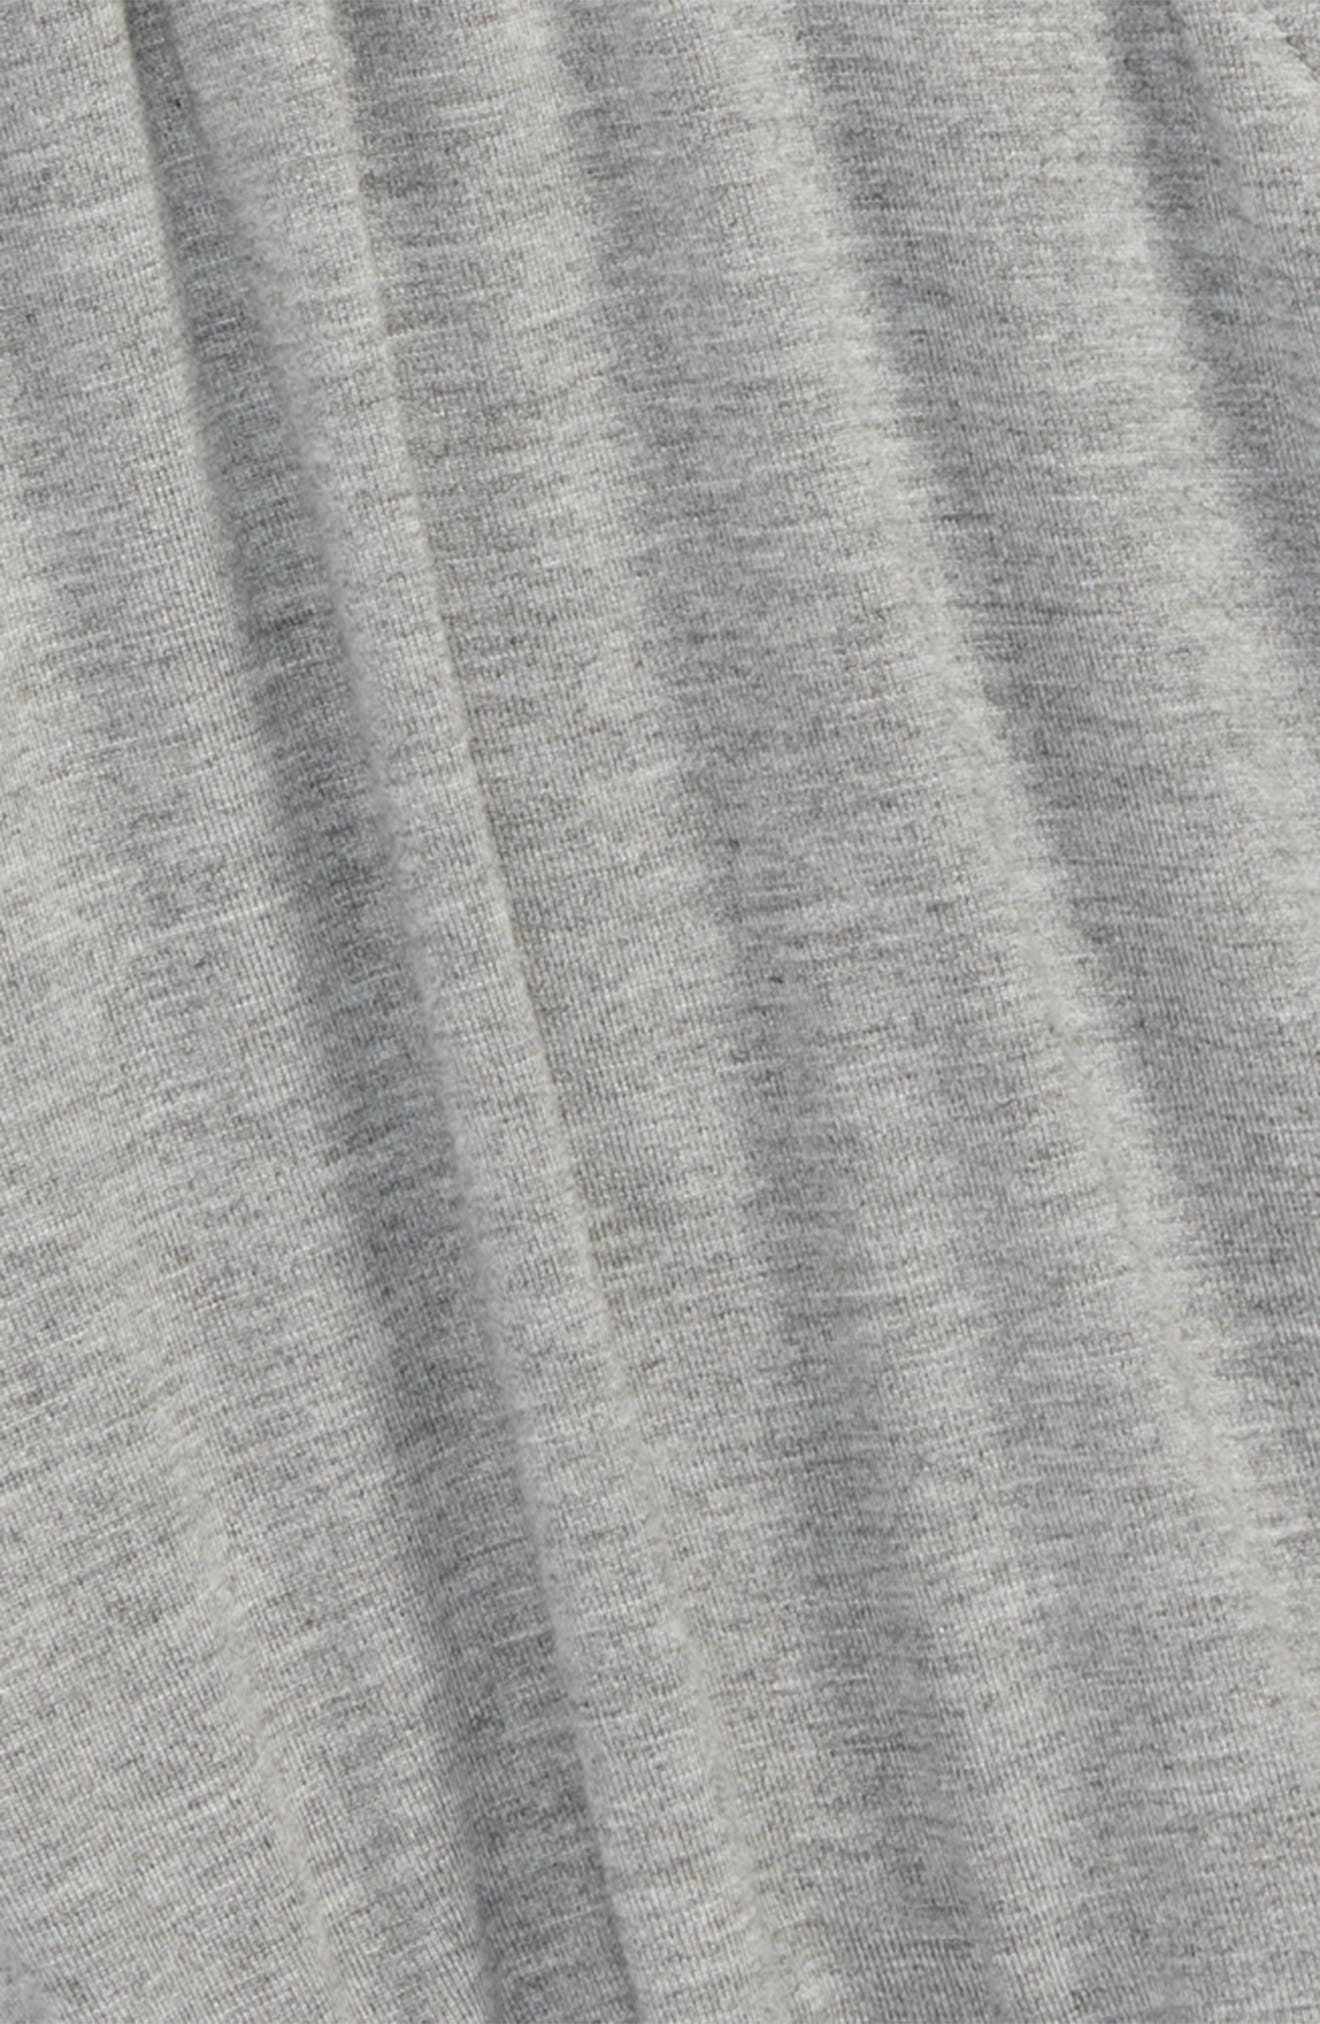 Ruffle Shorts,                             Alternate thumbnail 2, color,                             030